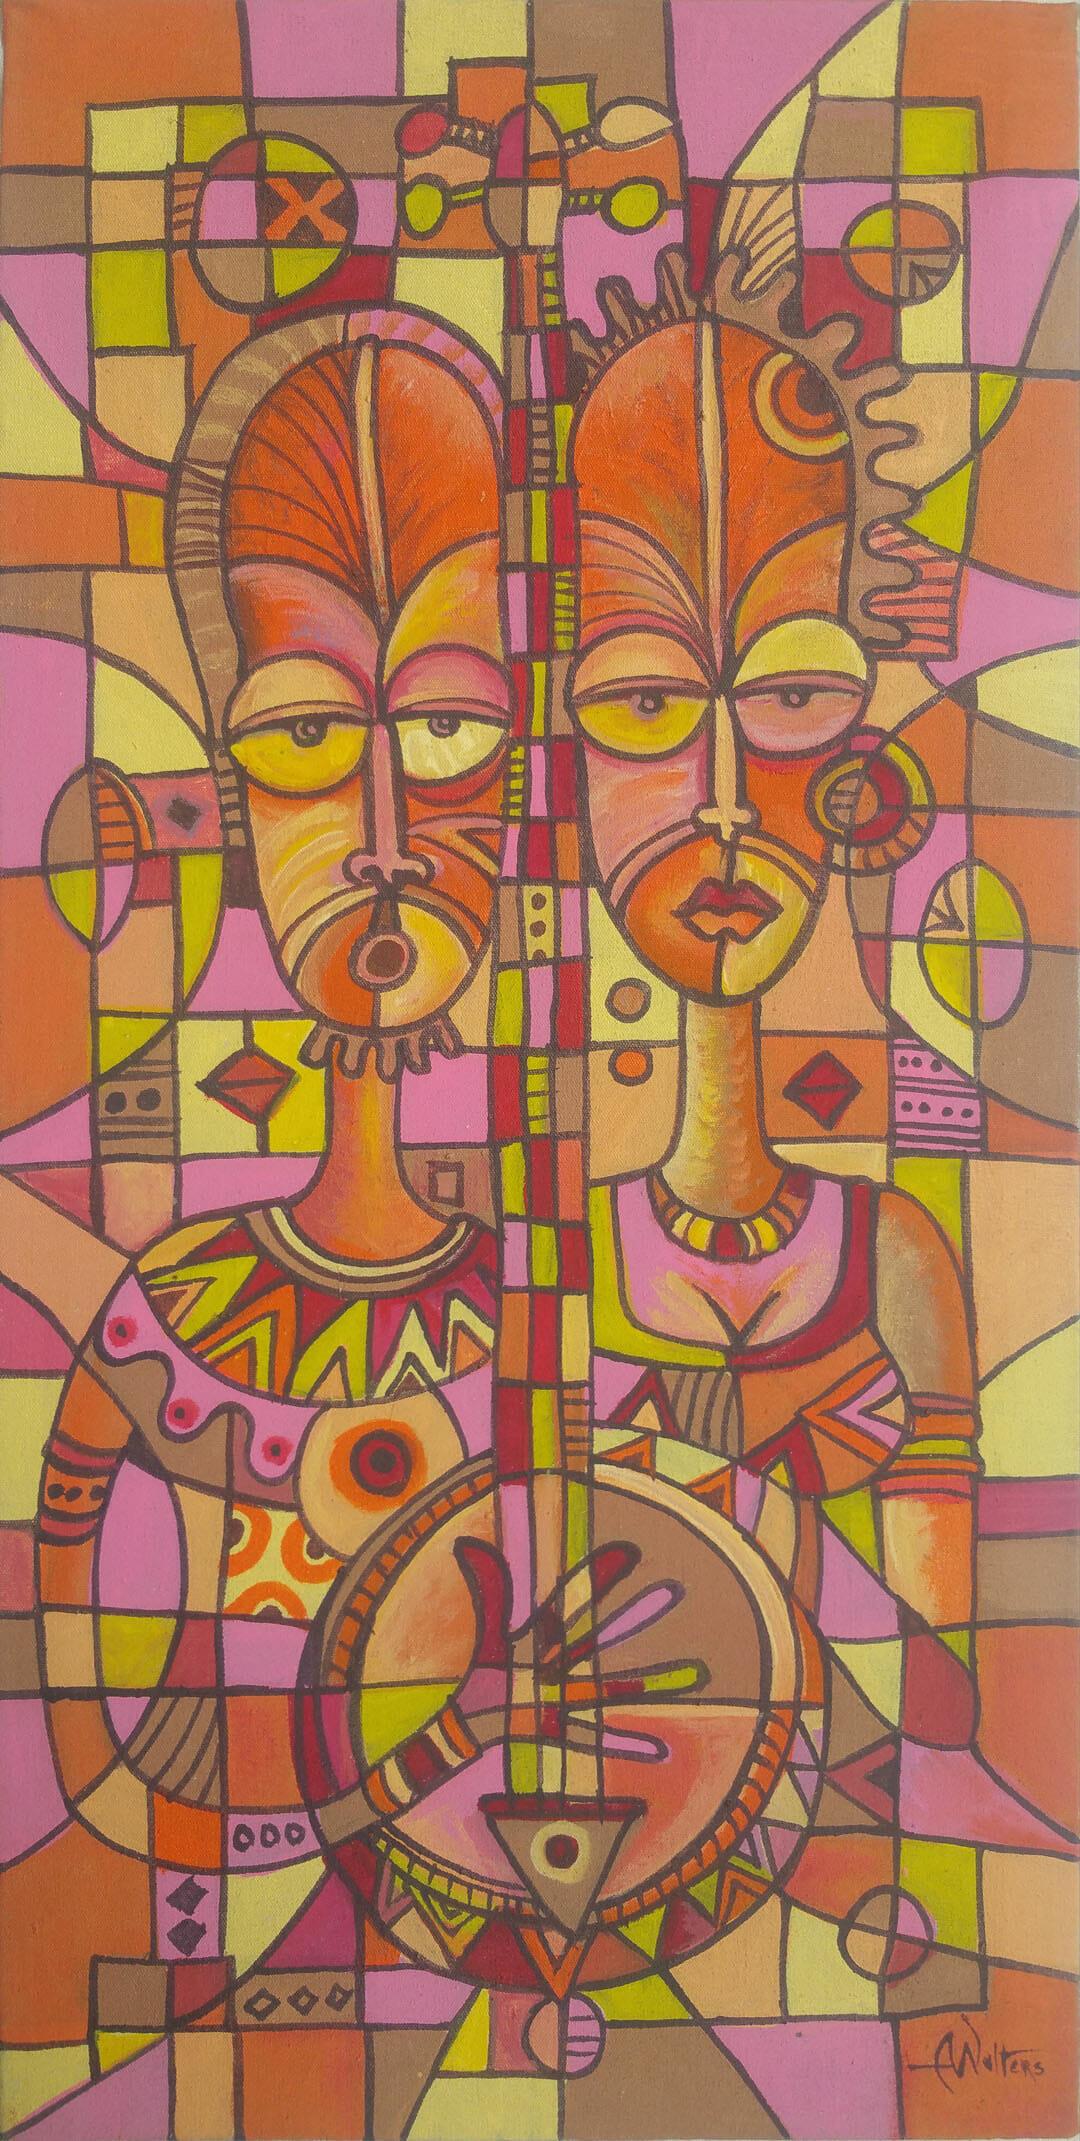 Music is Love 7 love songs painting